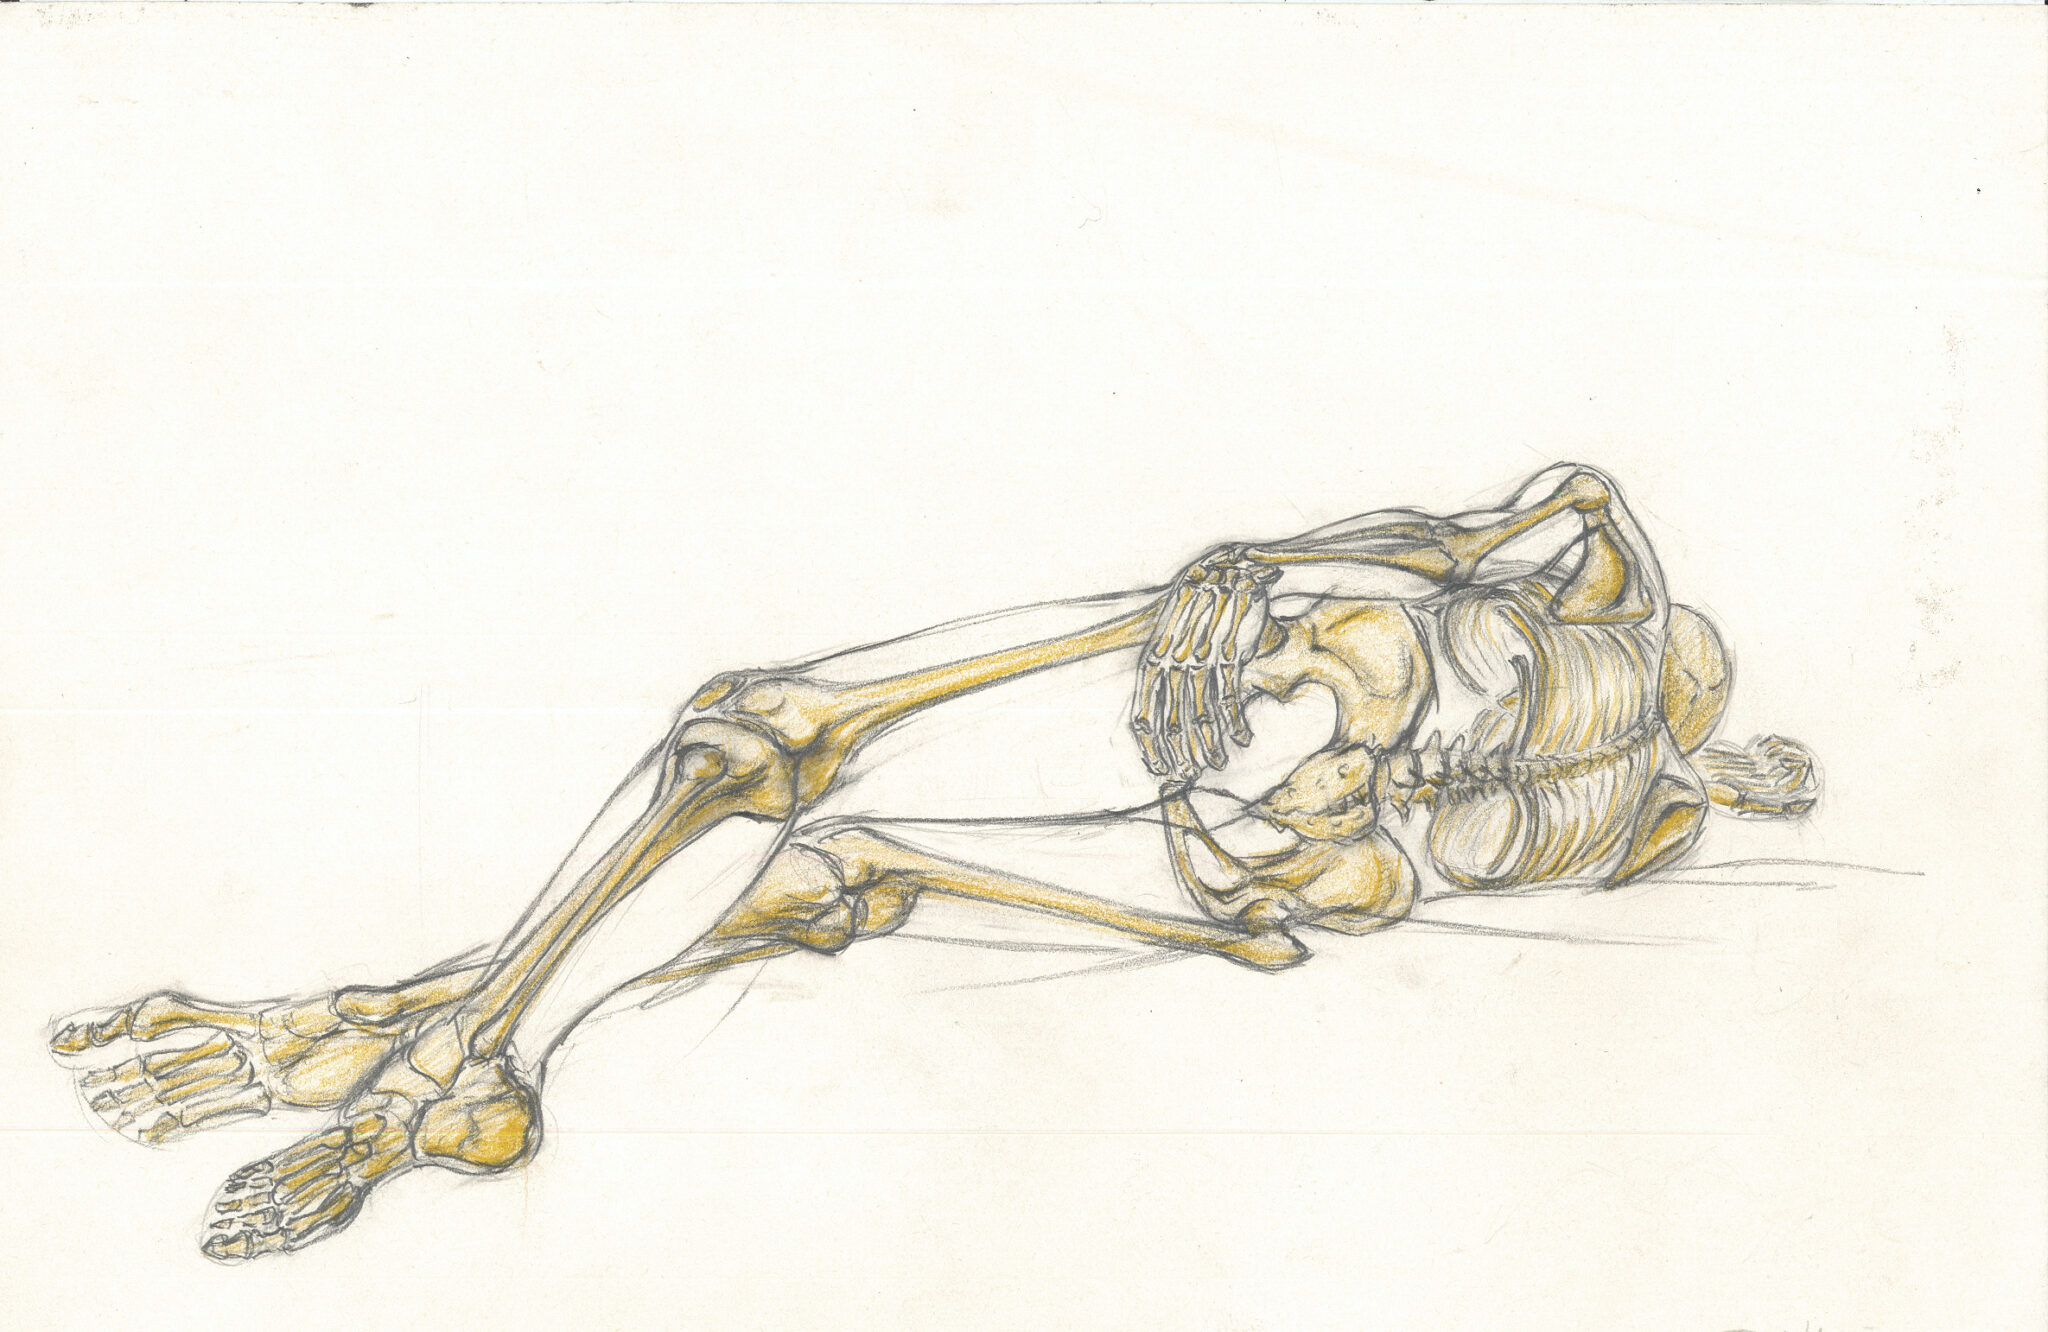 Squelette (crayon, crayon couleur)